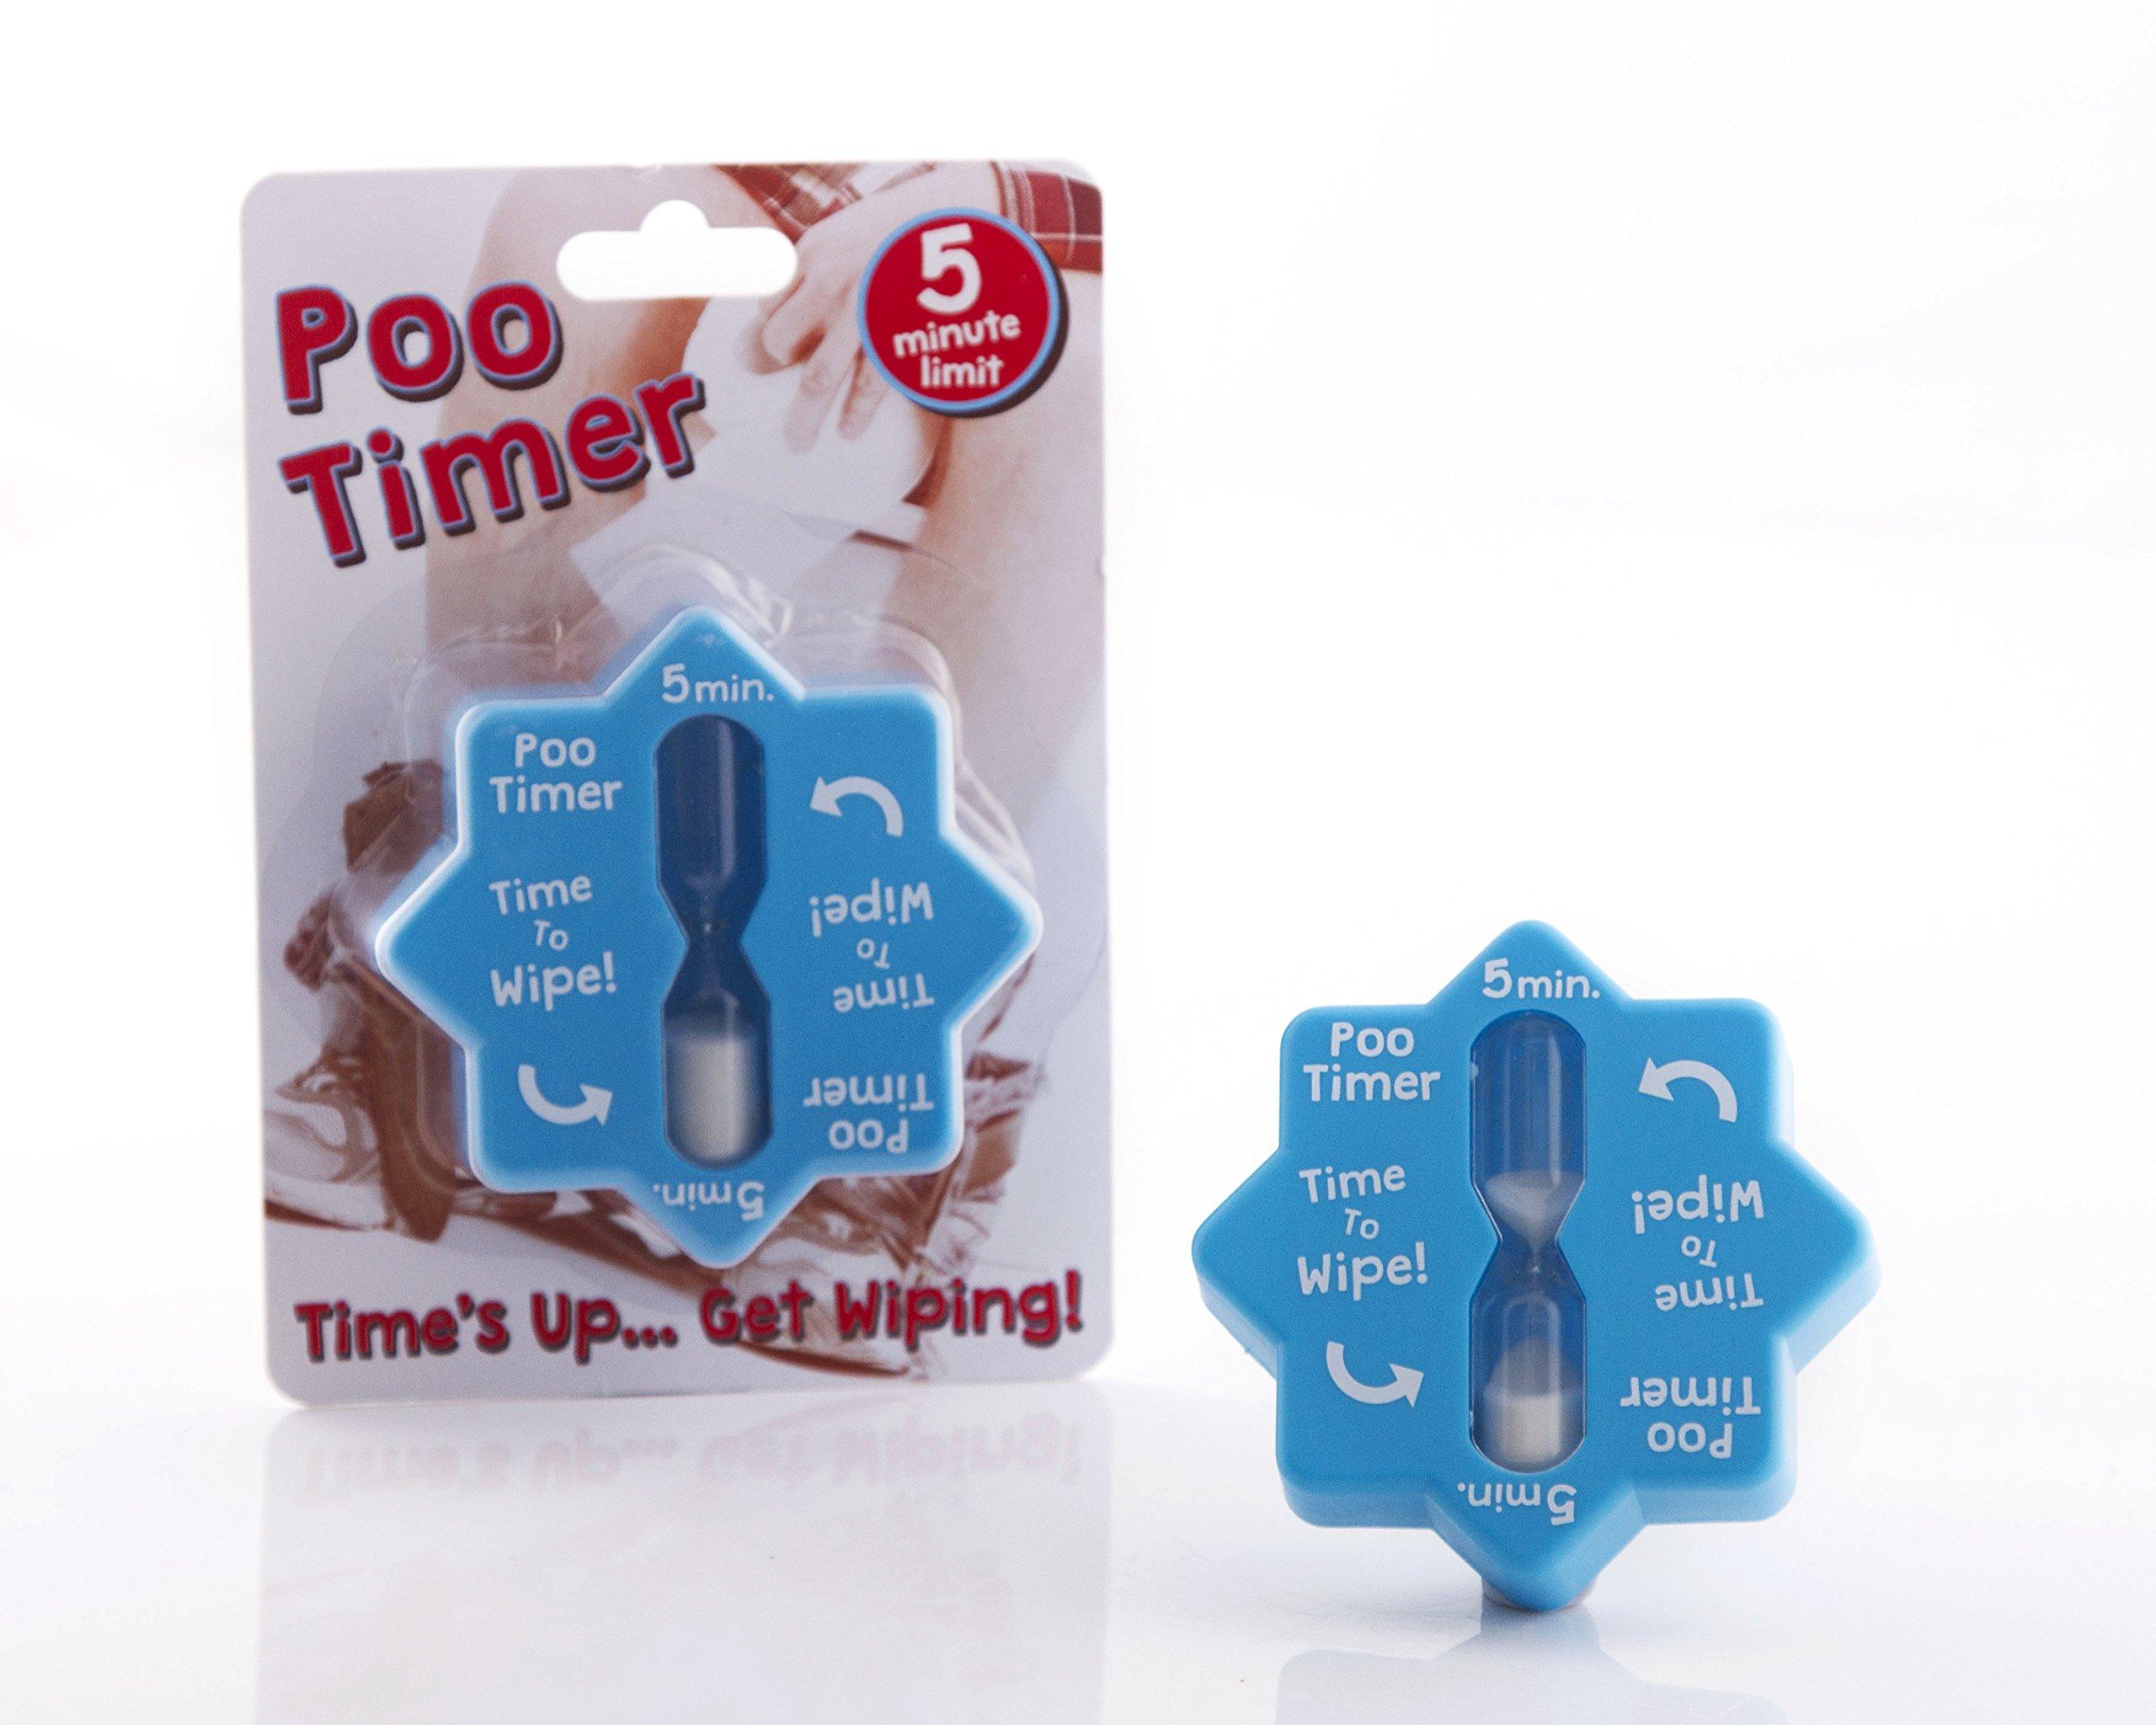 Boxer Gifts OT2054 Novelty Poo Funny Toilet Timer   Birthday, Christmas, Secret Santa Gift for Husbands, Dads and Other Men, 8.5 x 8.5 x 3.5cm